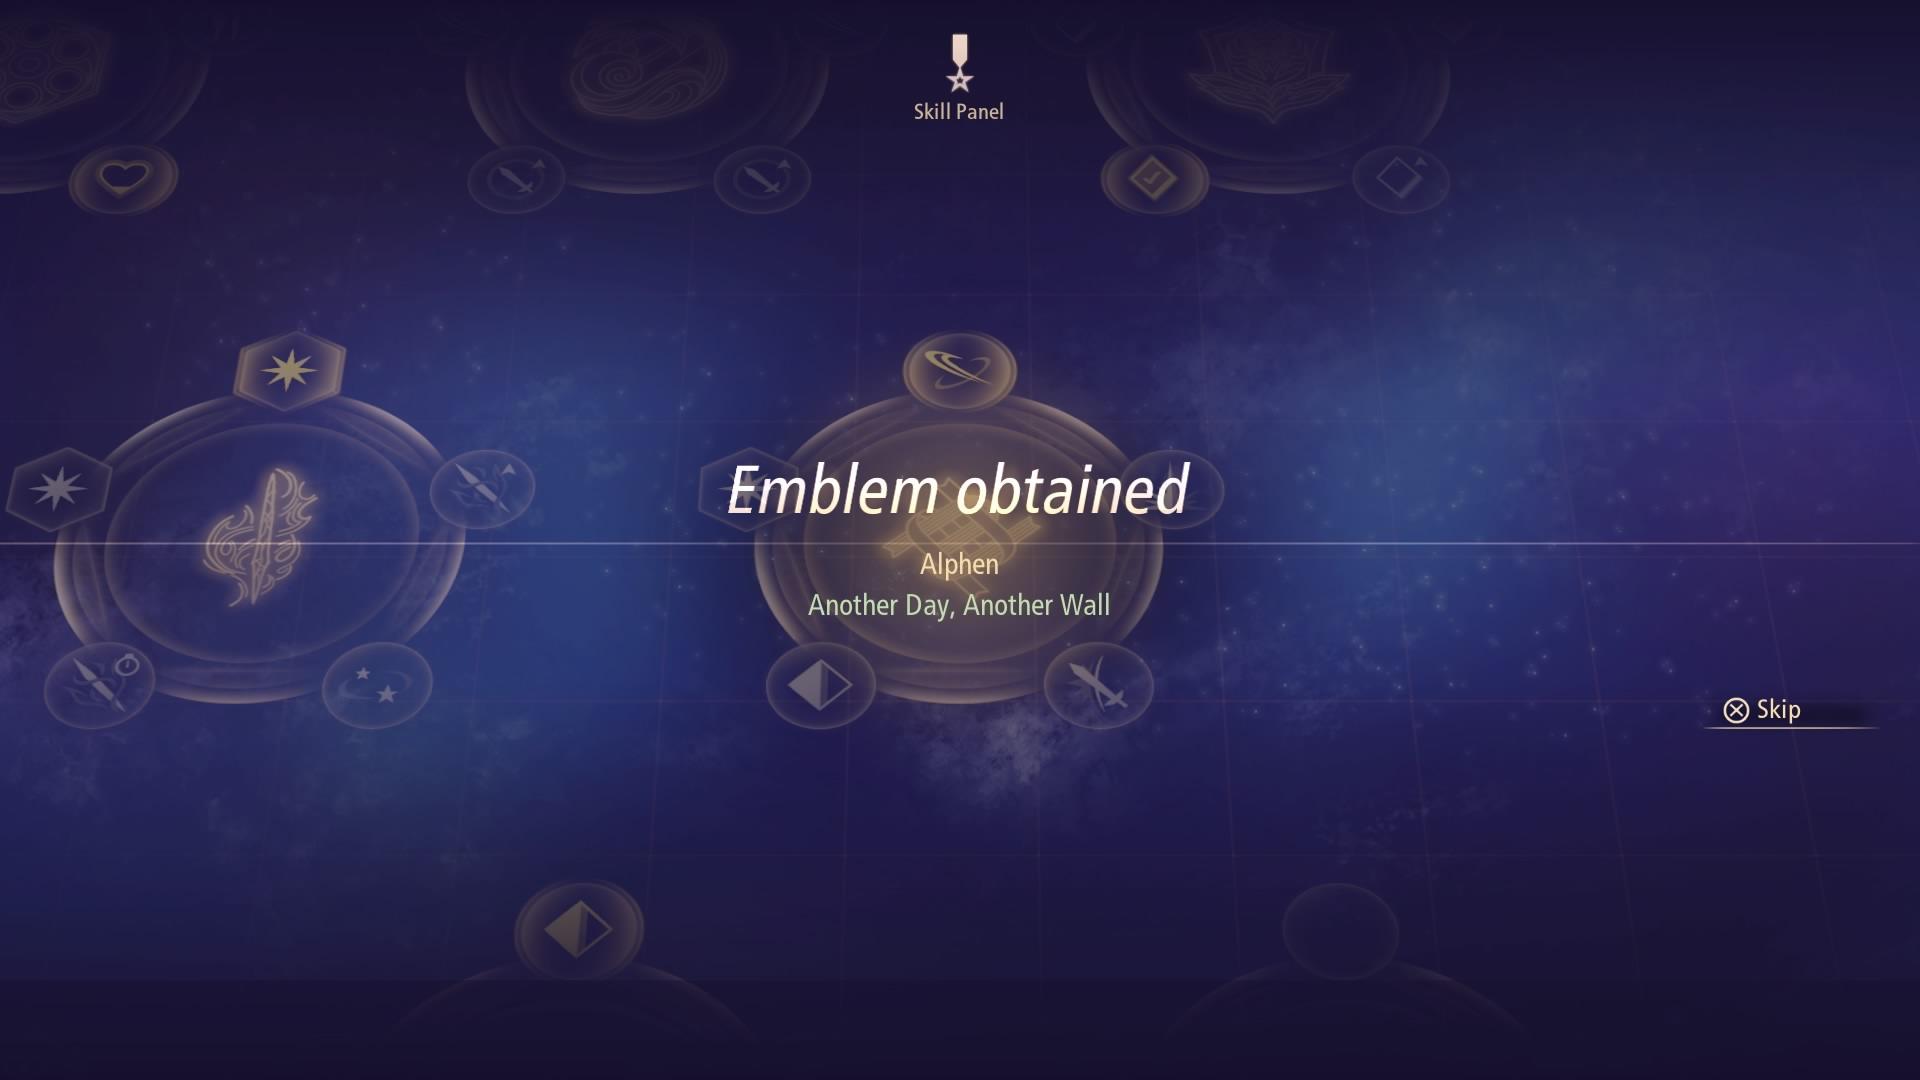 Alphen Emblem